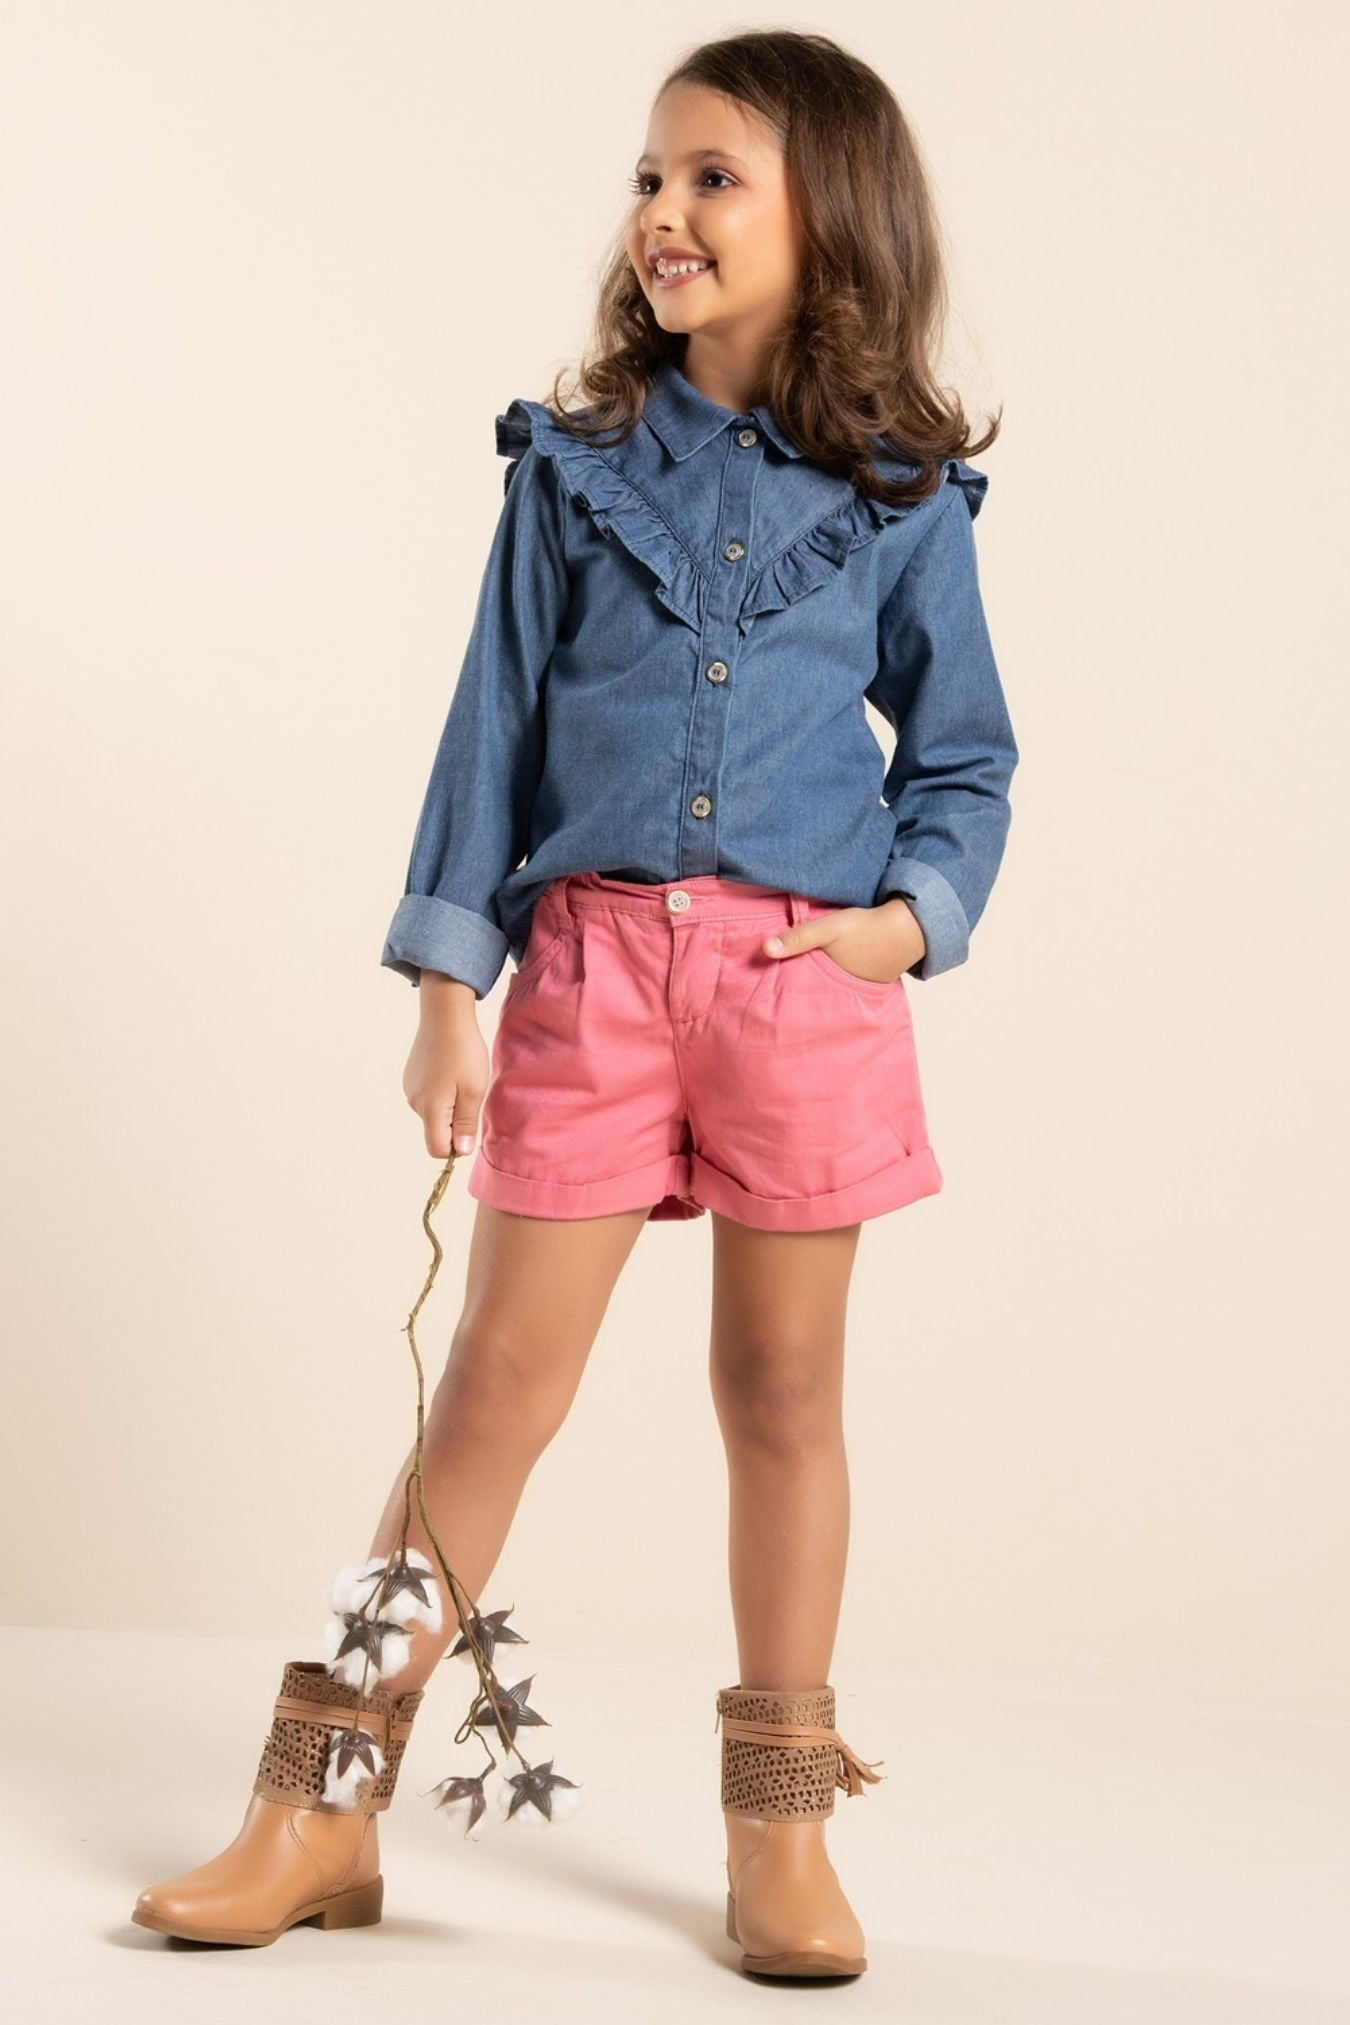 Camisa infantil jeans manga longa com babados